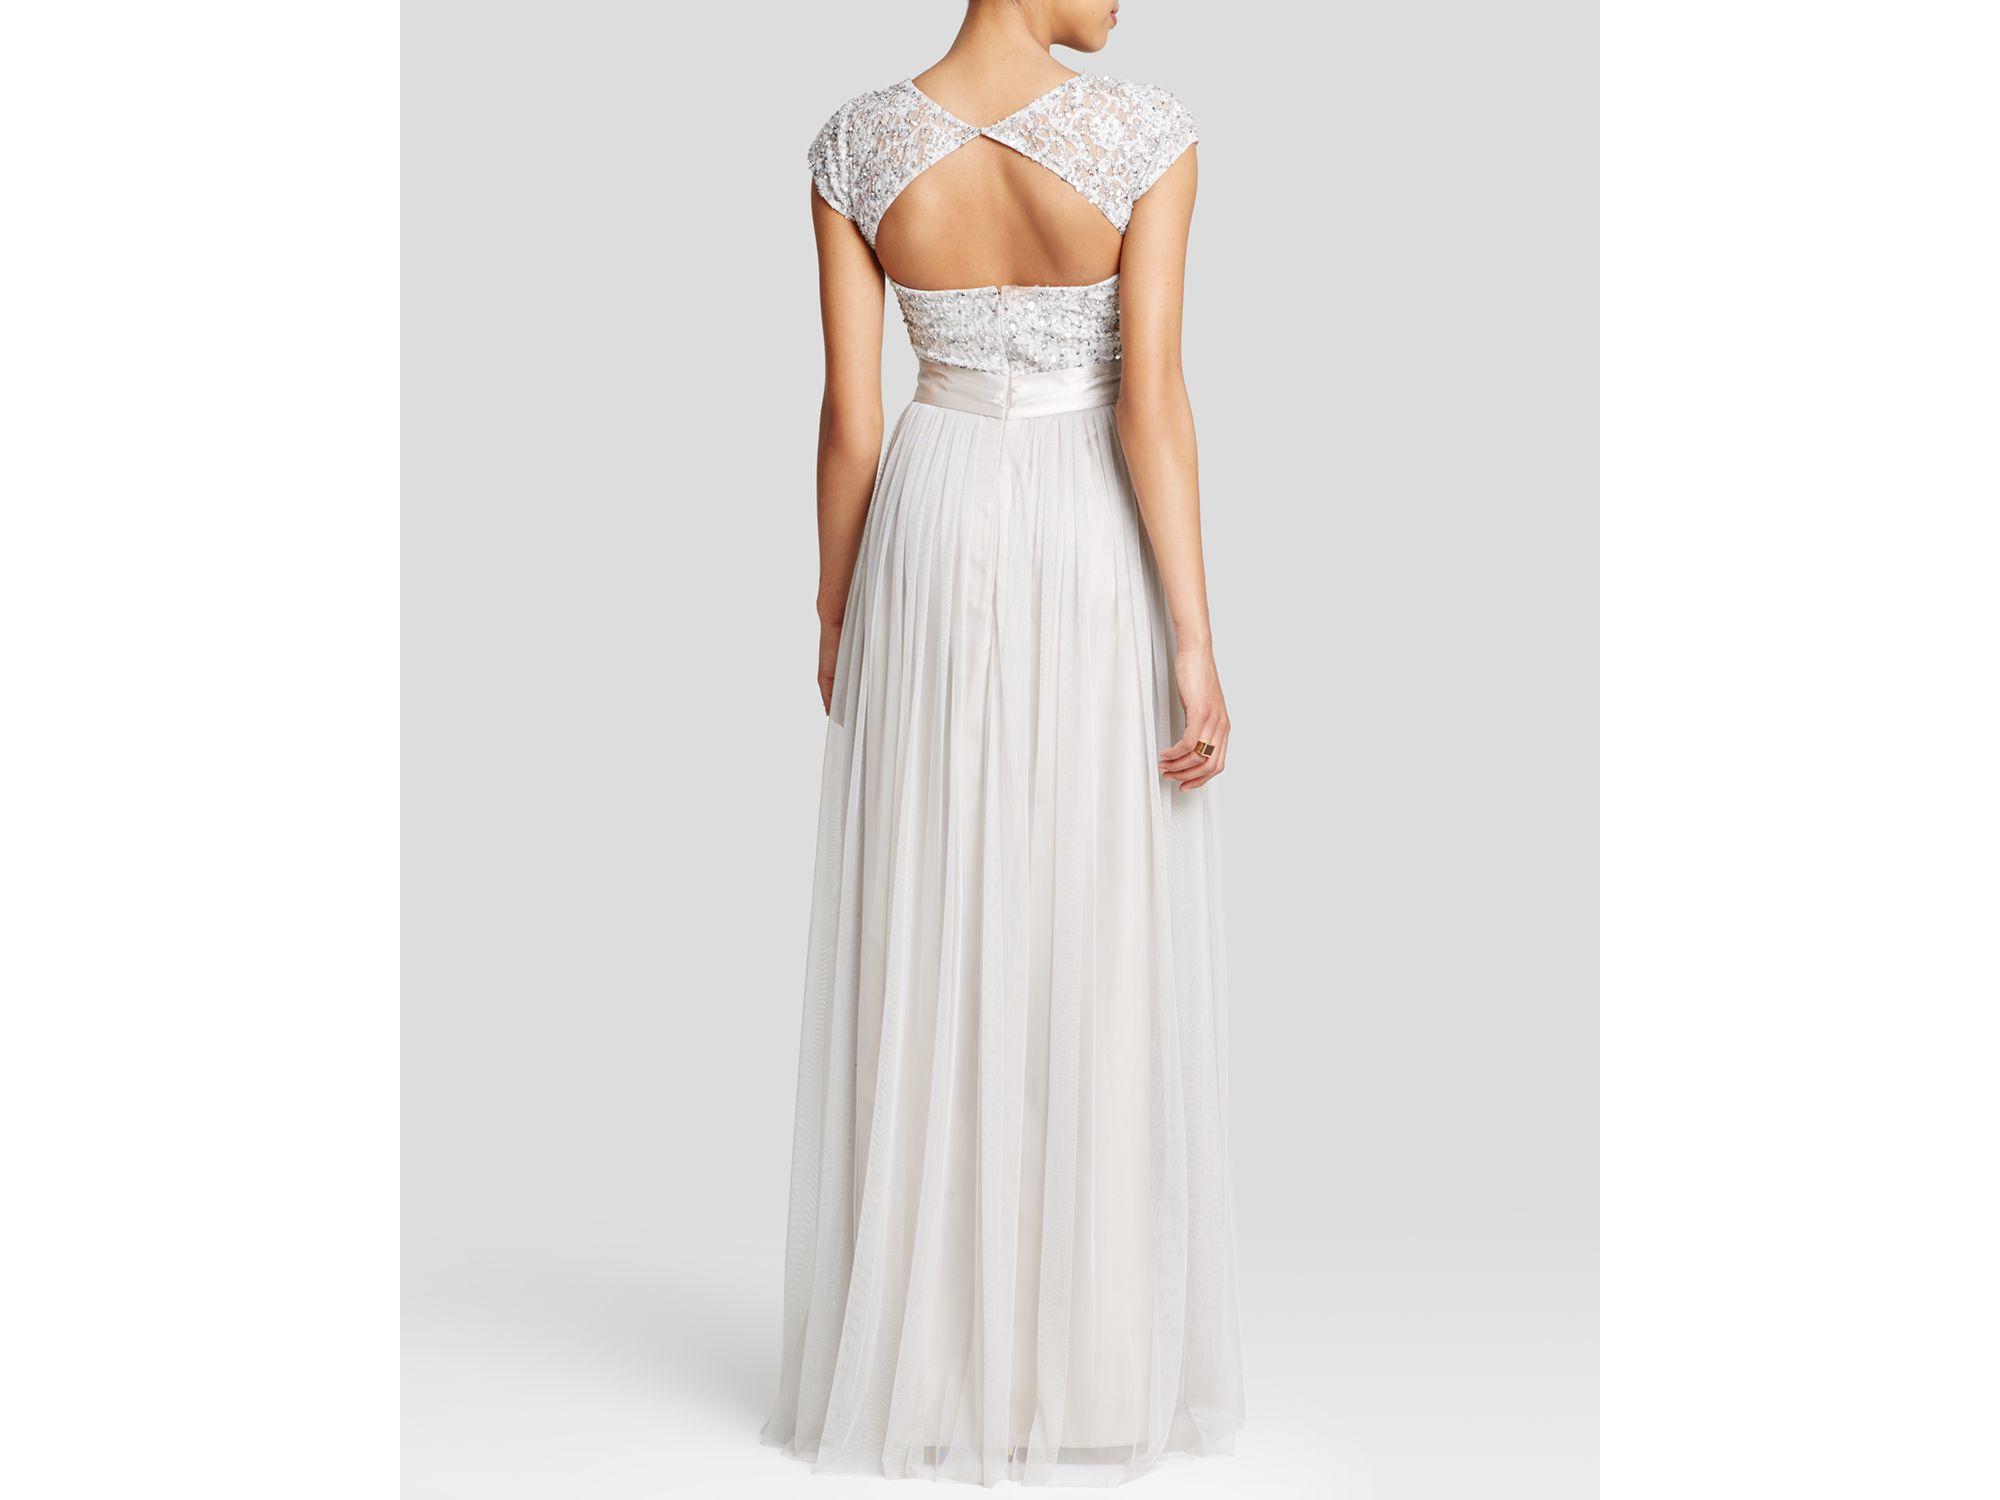 Lyst - Aidan Mattox Gown - Cap Sleeve Belted Lace Bodice & Chiffon ...